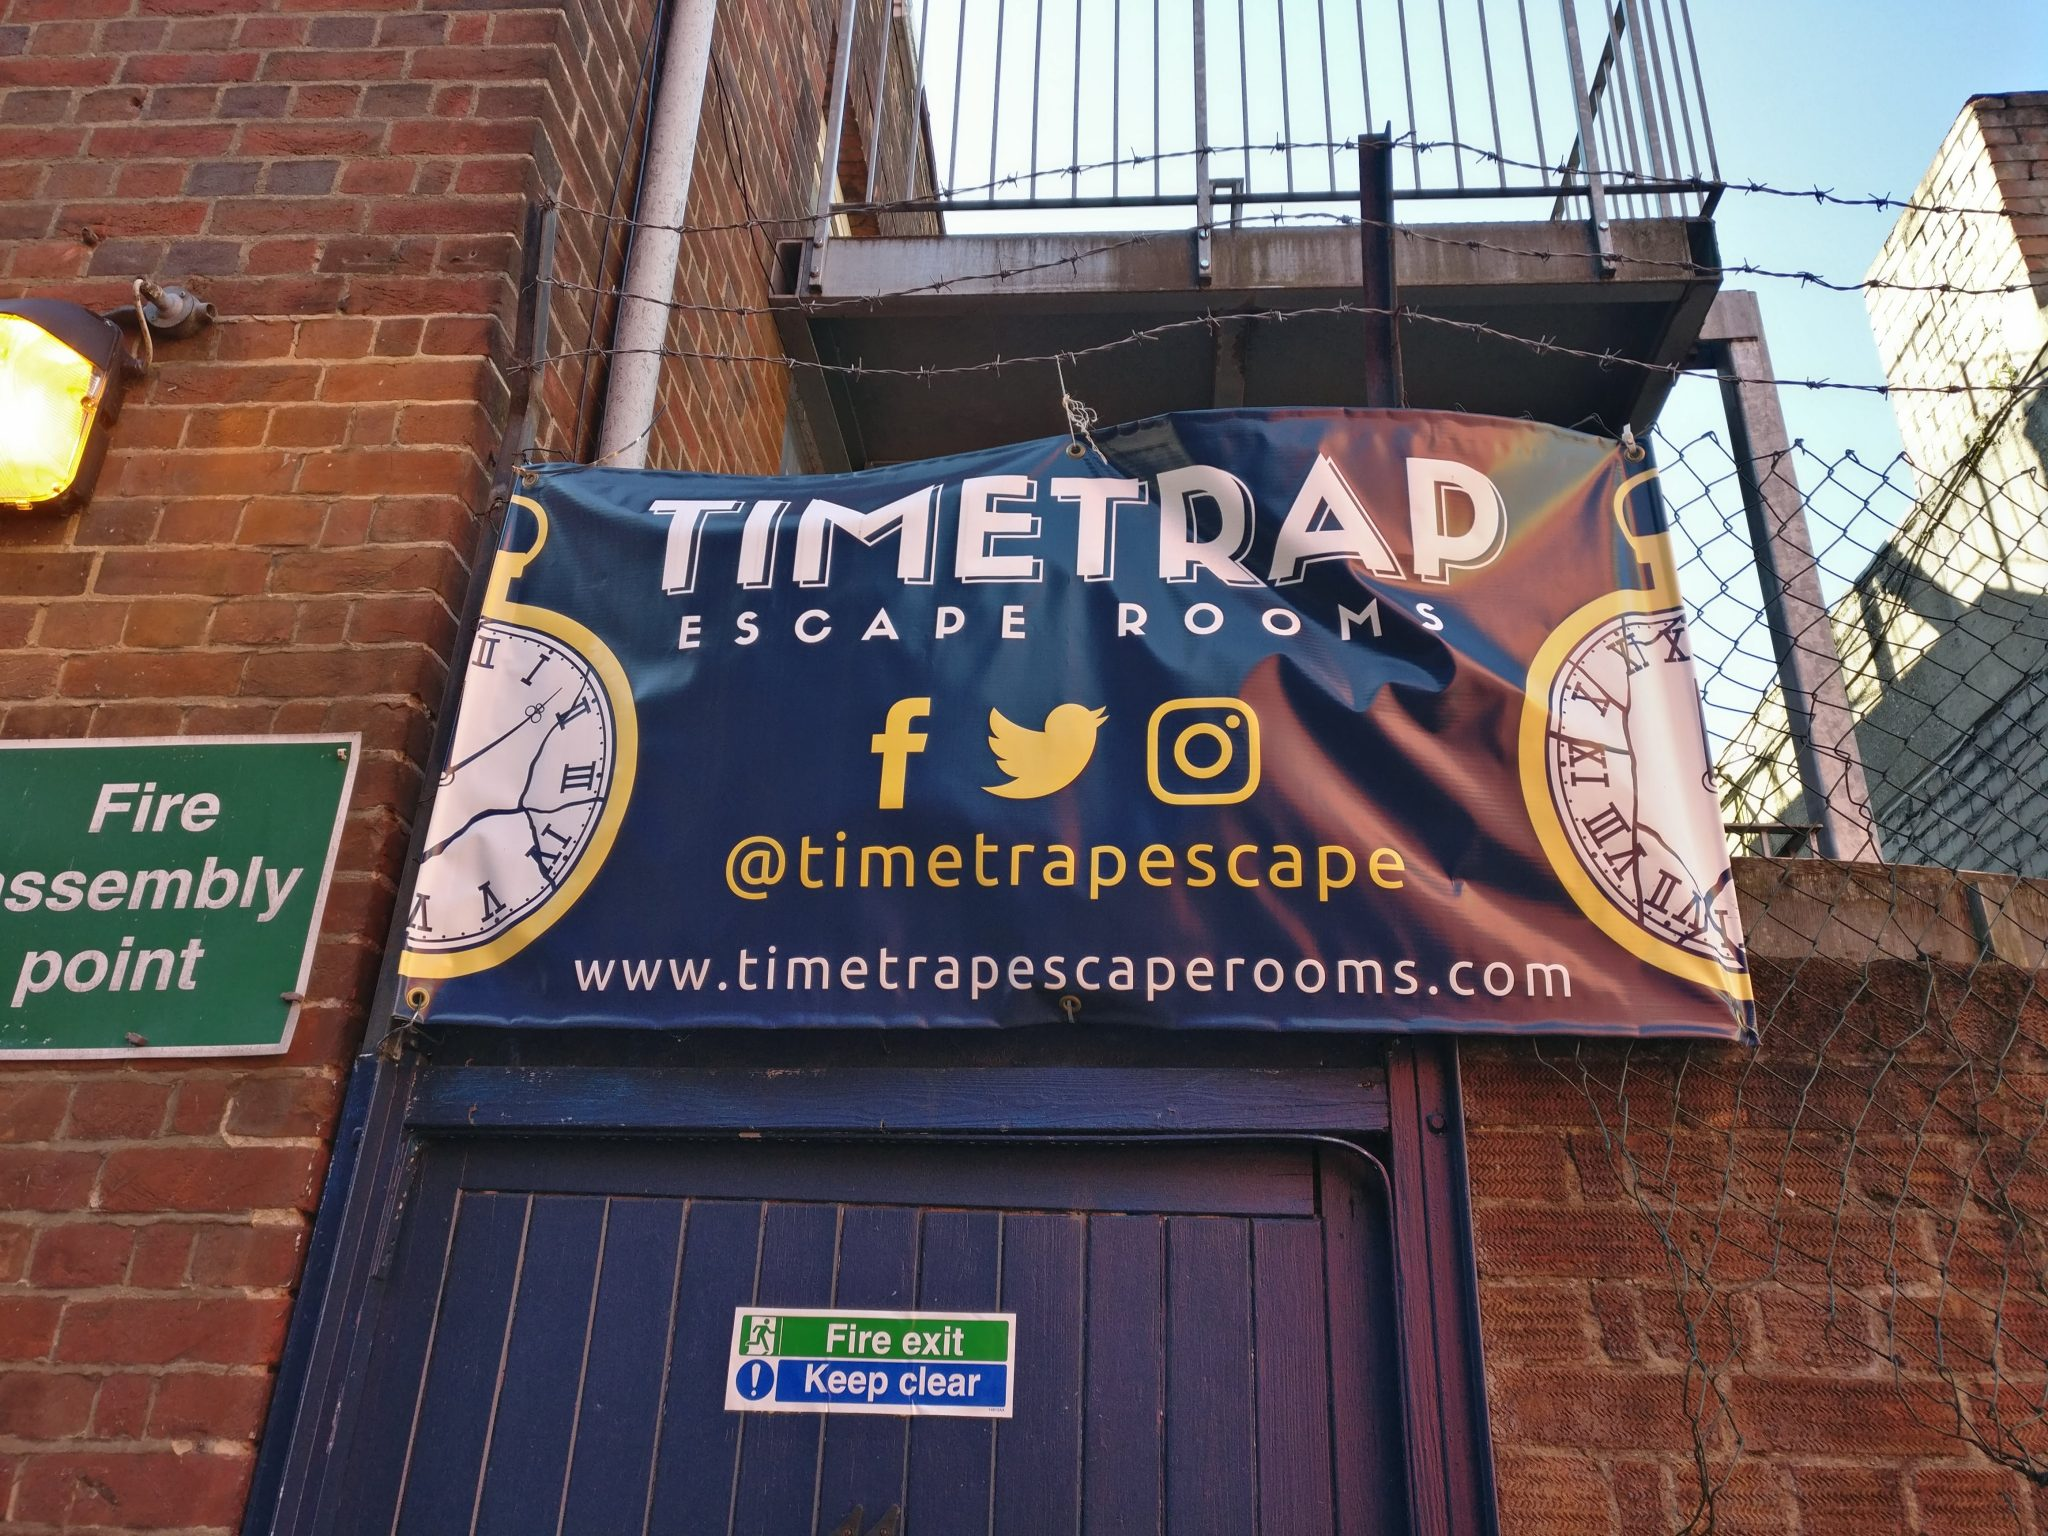 The entrance to Timetrap